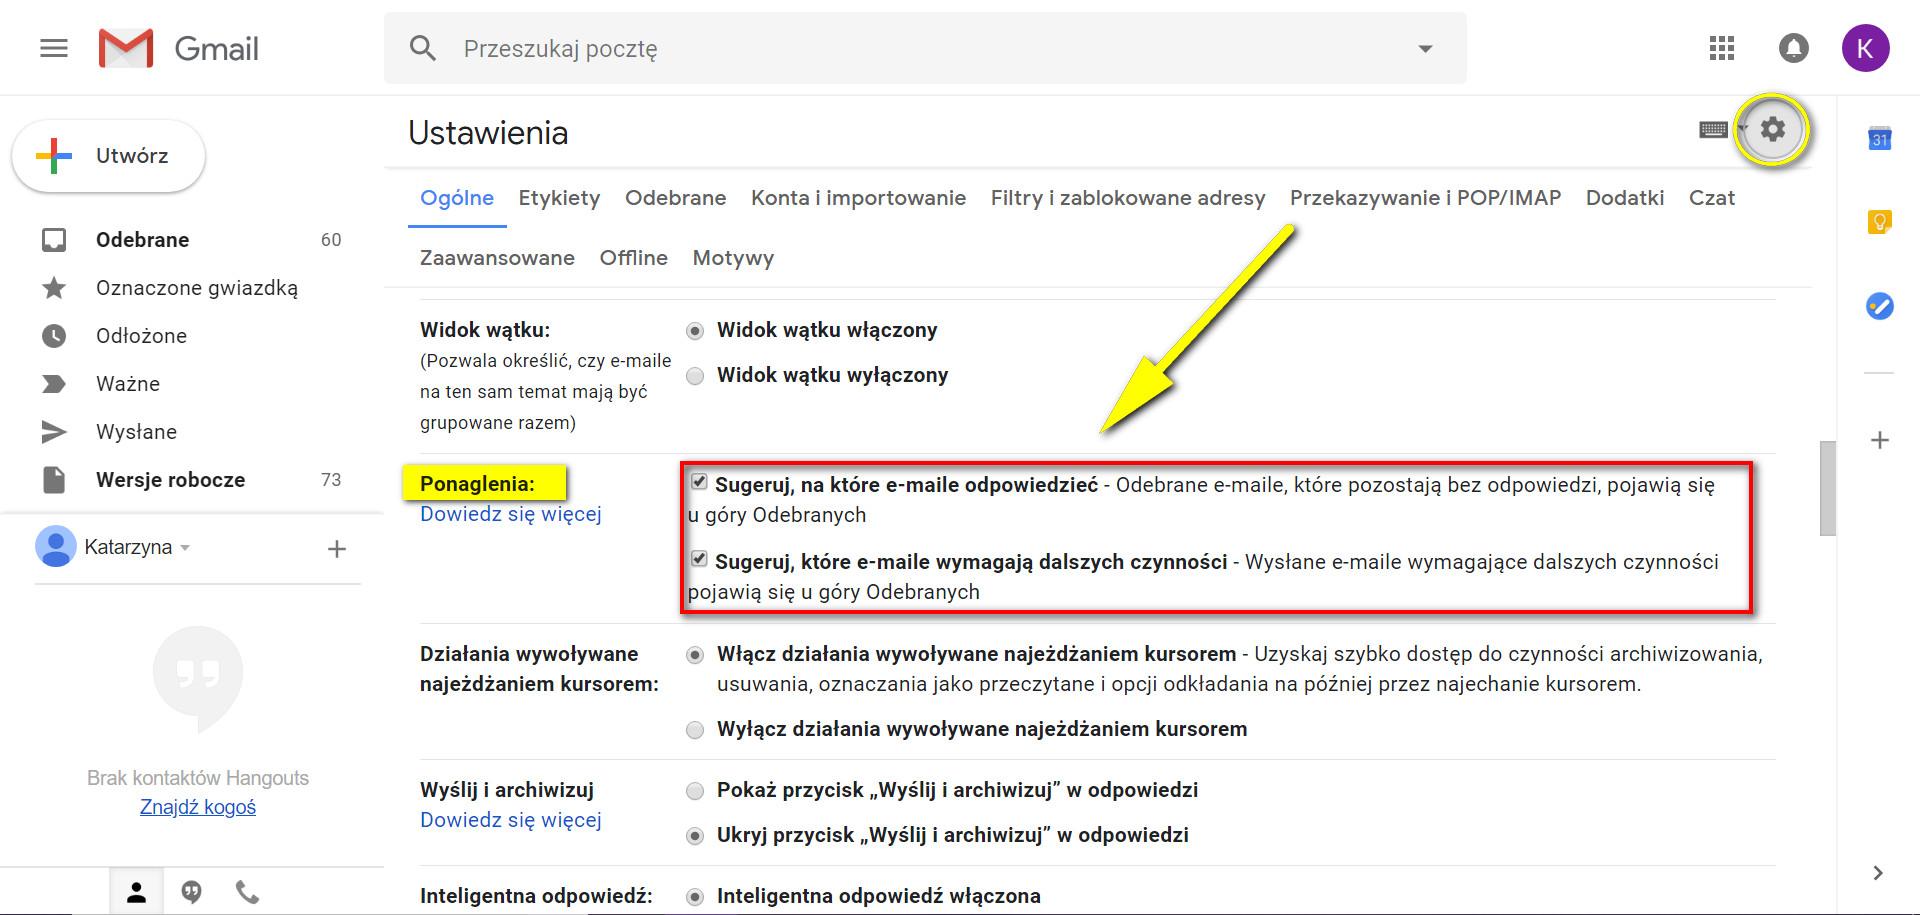 Gmail Ponaglenia